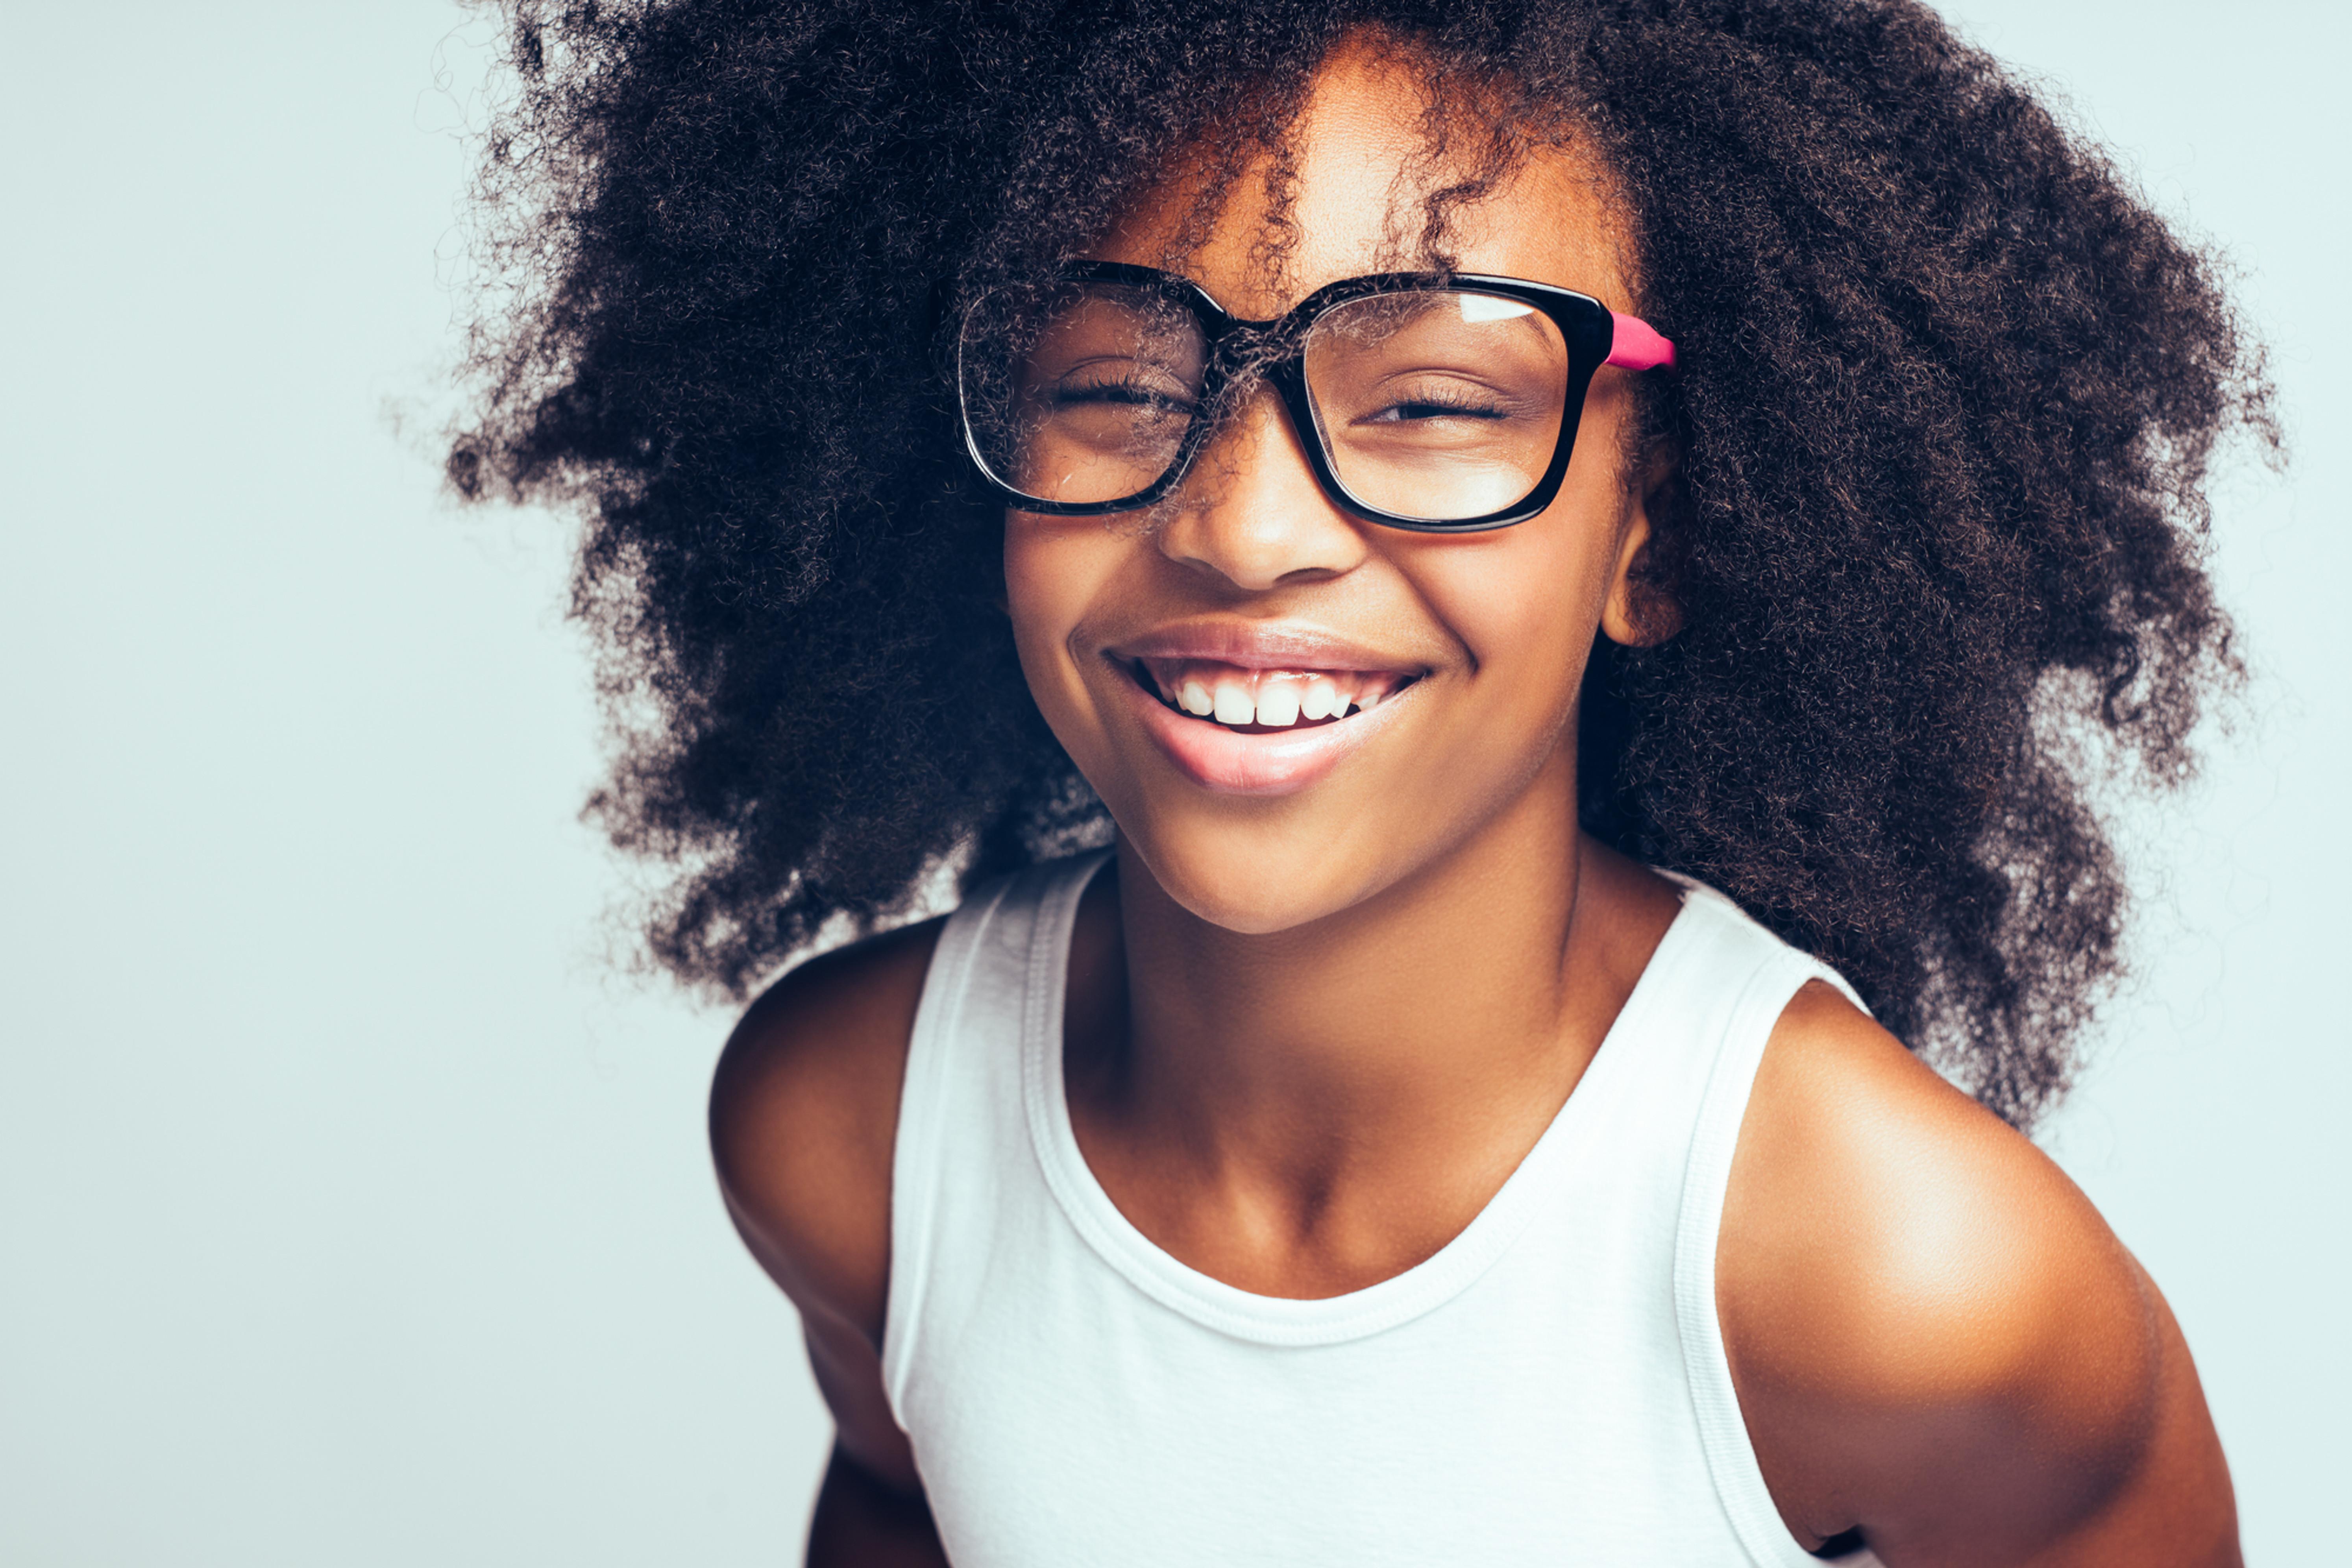 Pediatric Annual Comprehensive Eye Exam